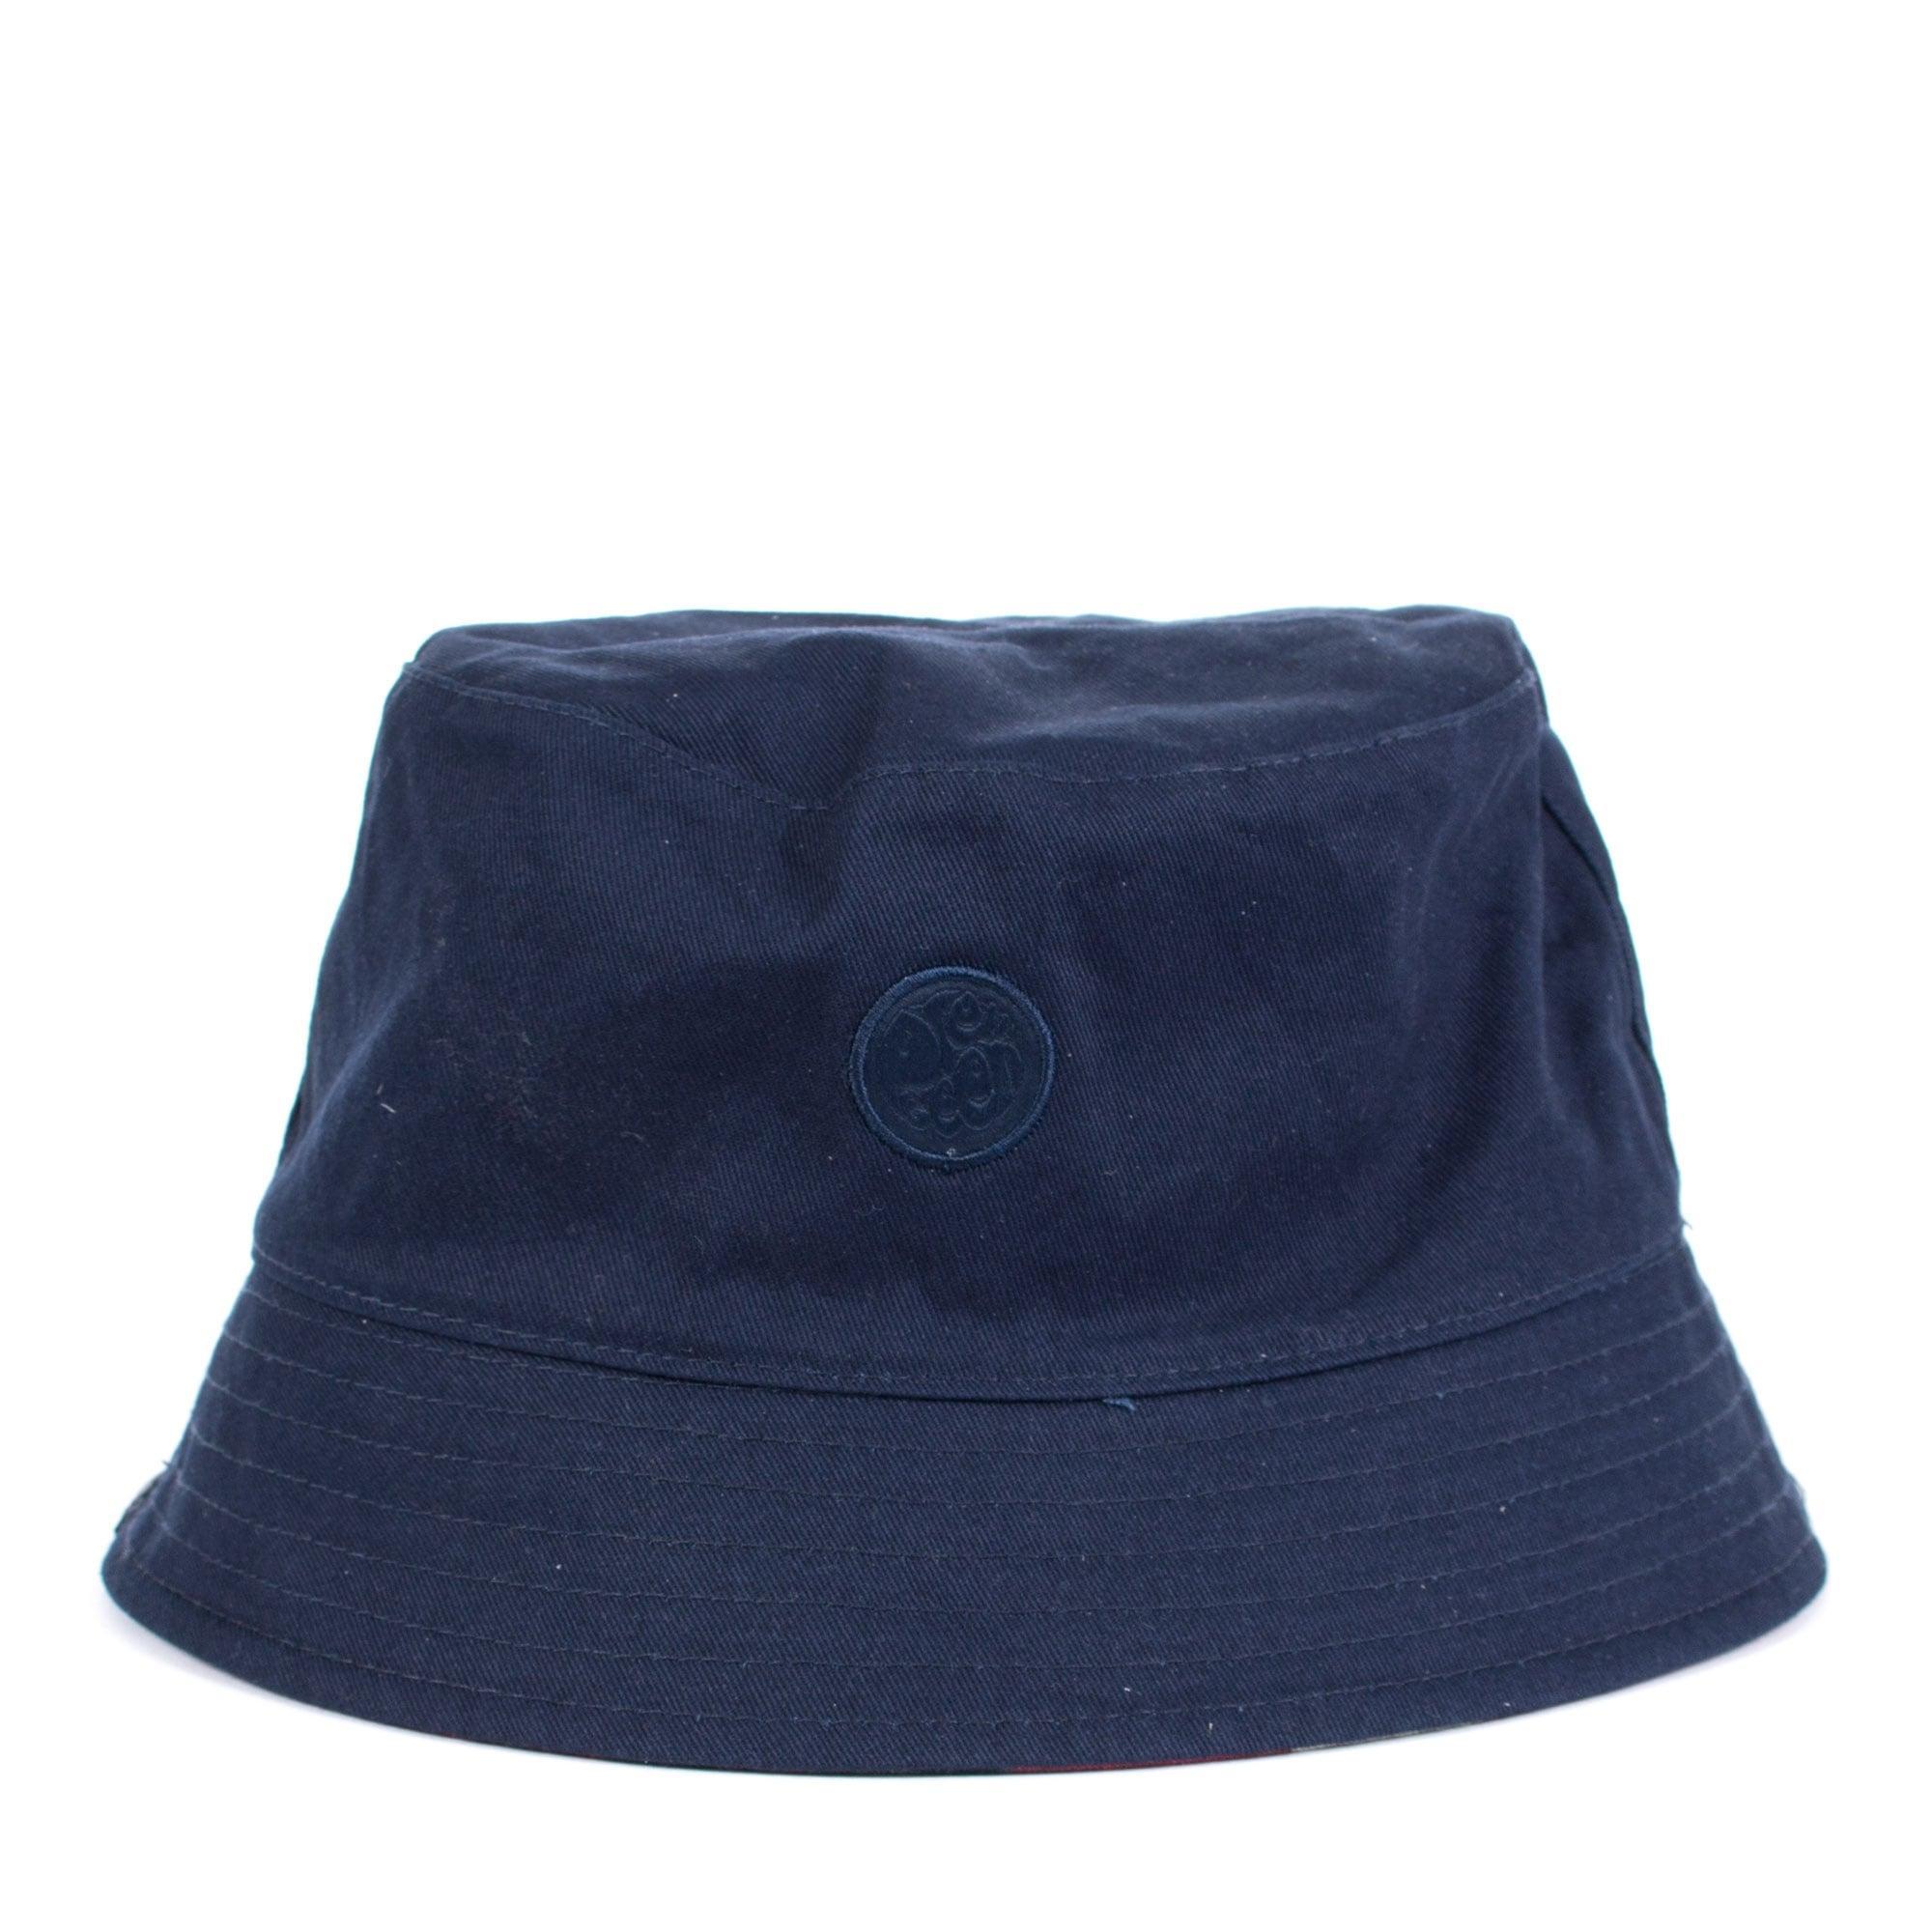 18b71f0d Lyle & Scott - Blue Reversible Union Jack Bucket Hat for Men - Lyst. View  fullscreen